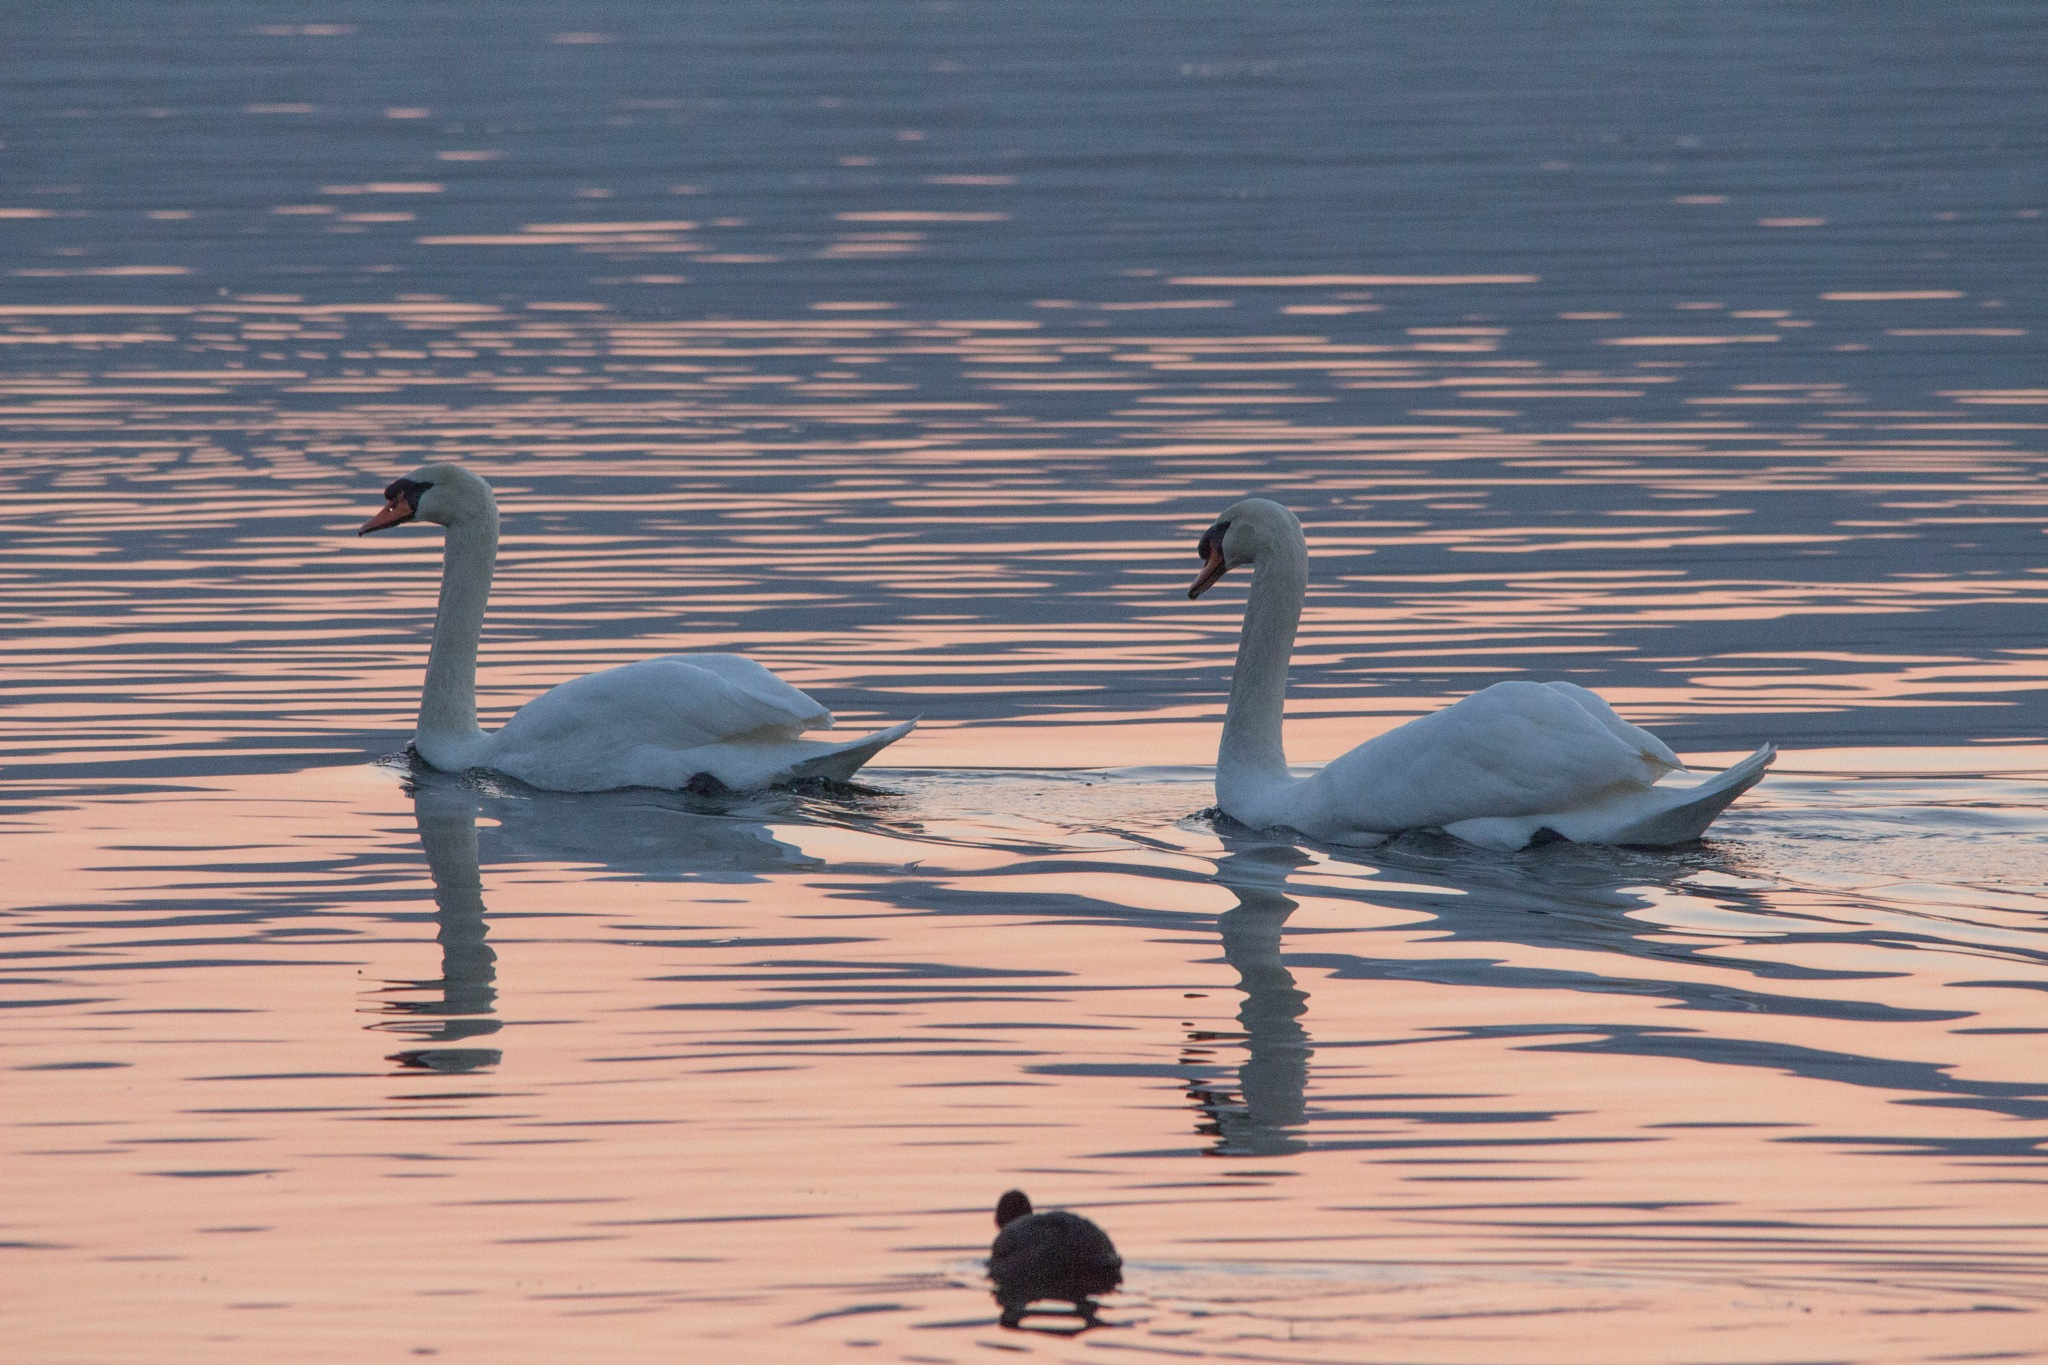 Swans at dusk by Andrea Prestileo